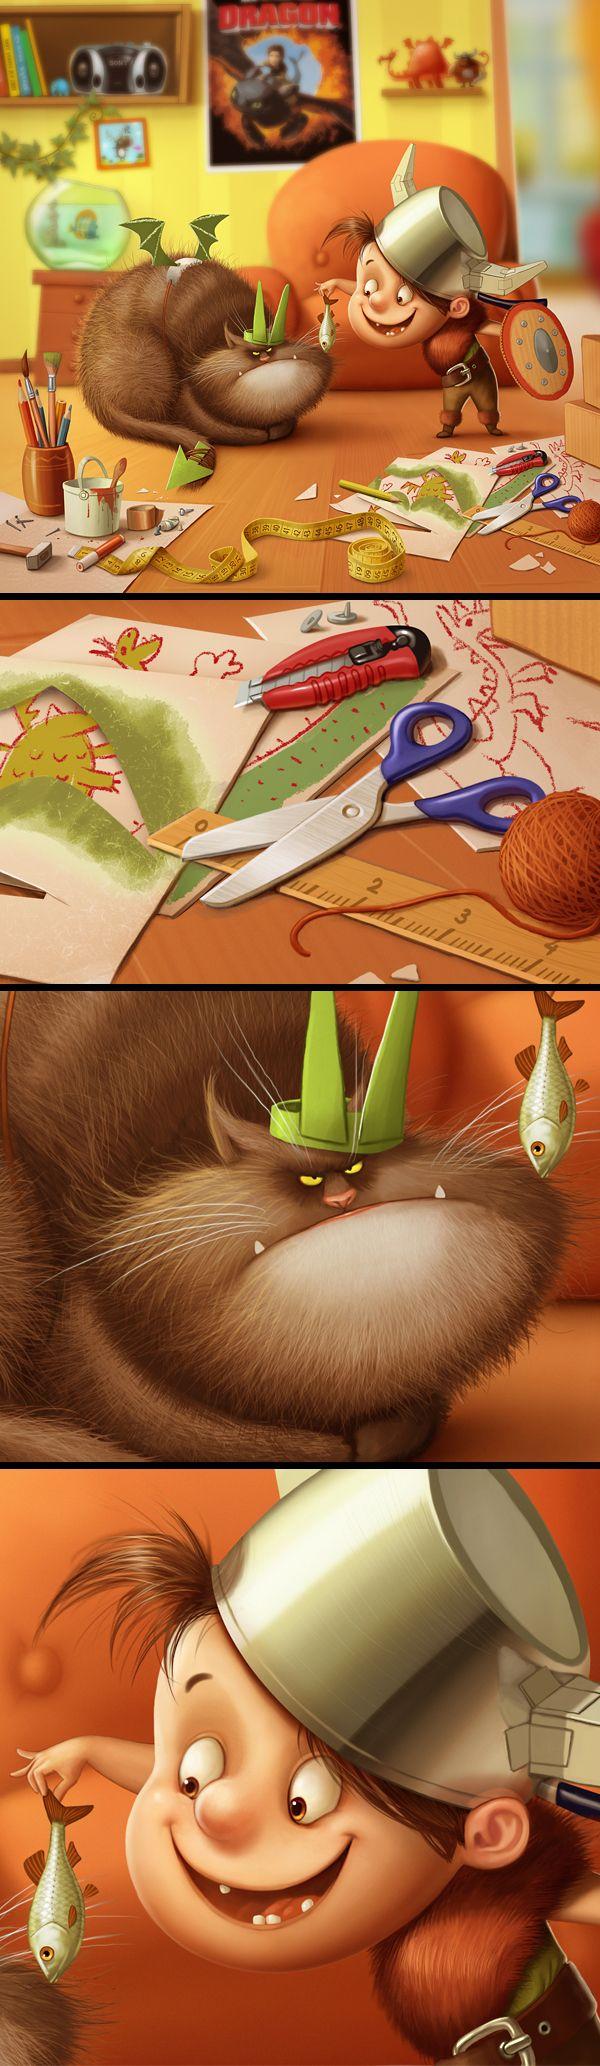 Illustration mix by Sergey Kardakov, via Behance ★ Find more at http://www.pinterest.com/competing